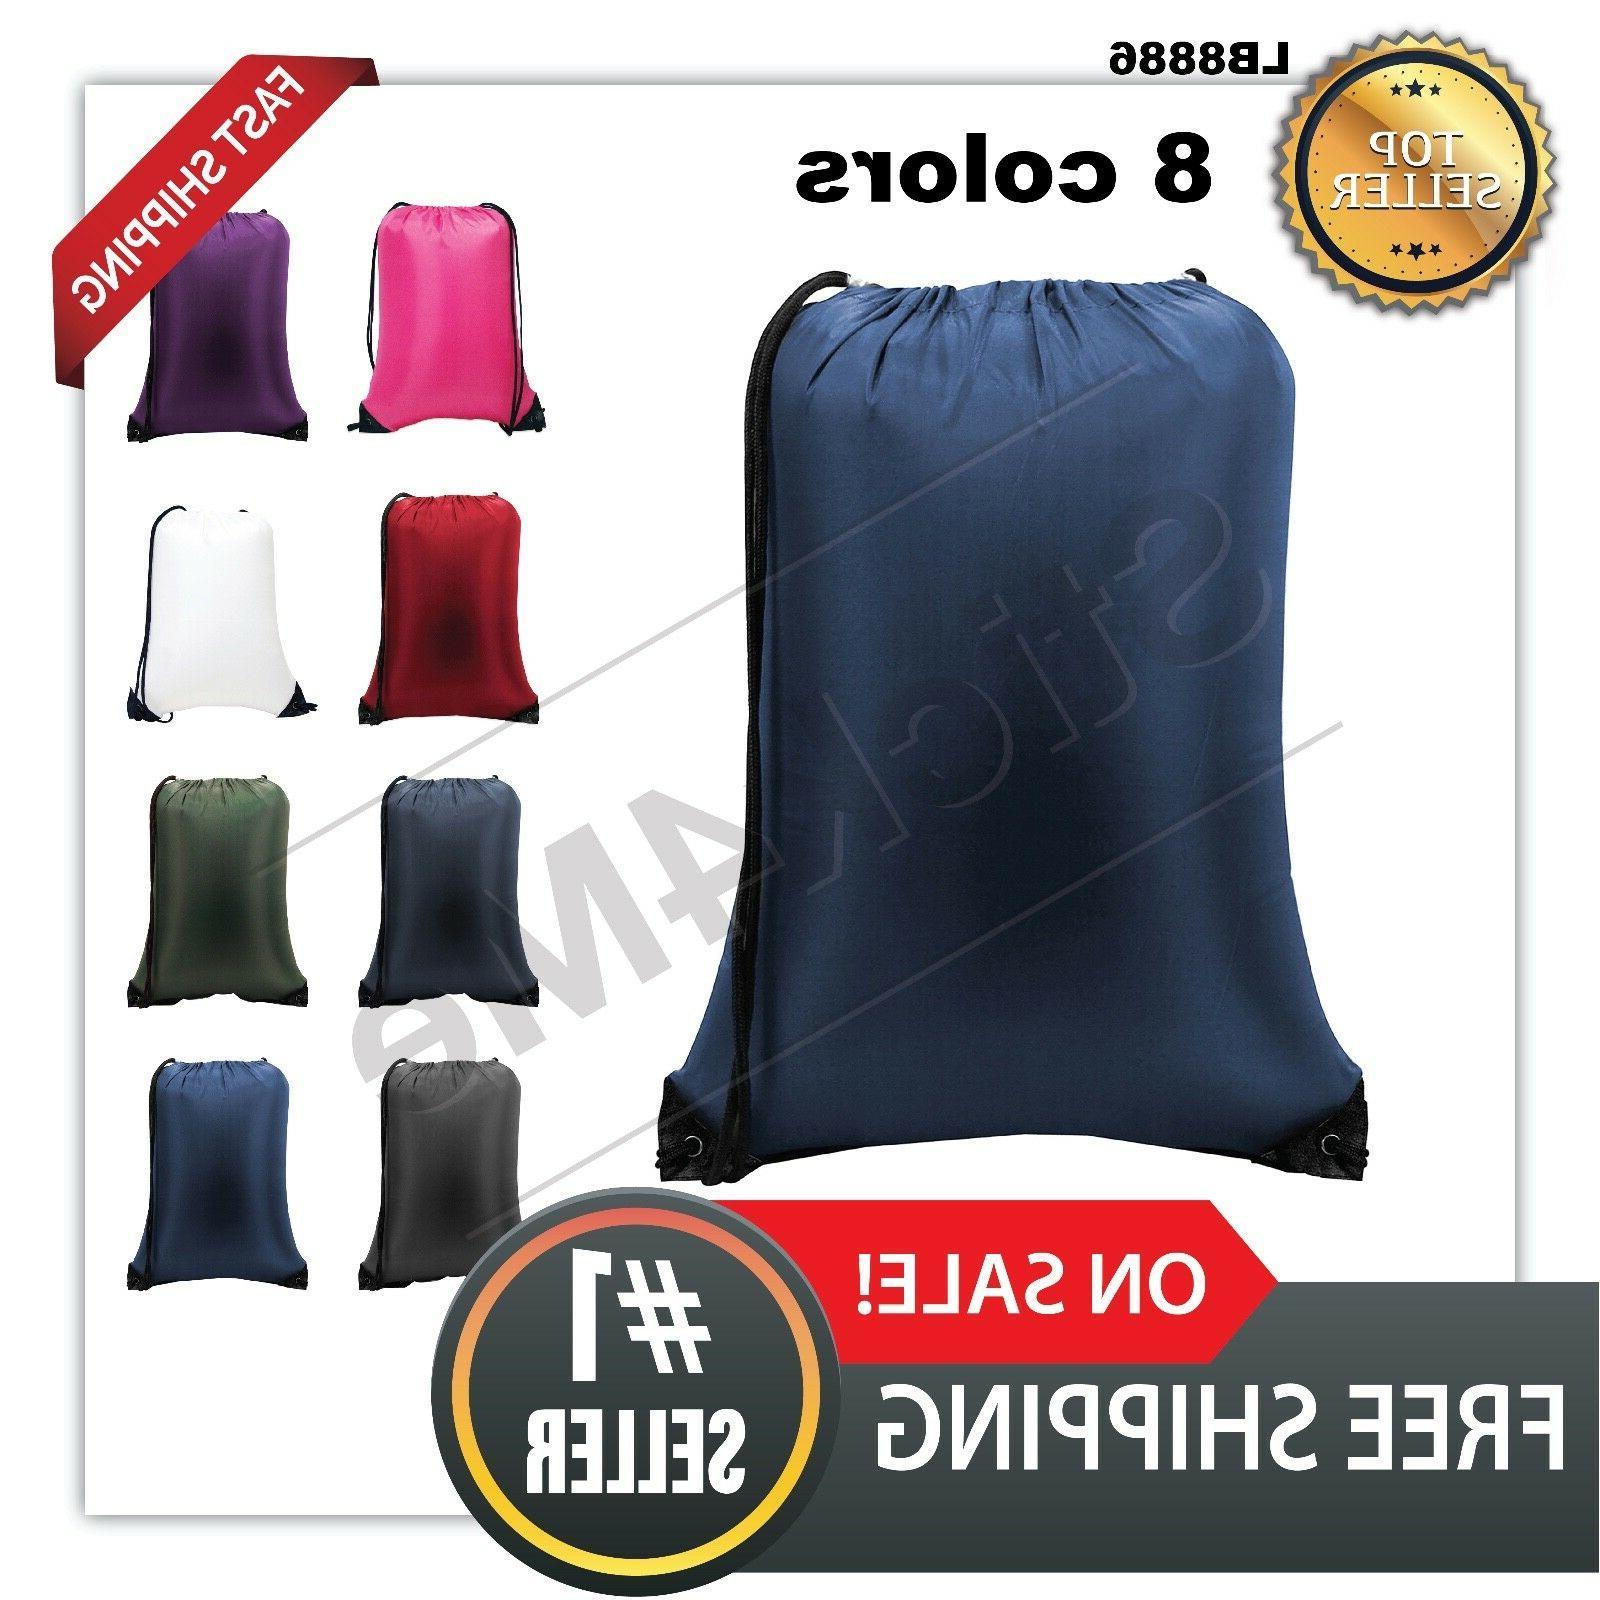 all new drawstring bag large backpack 8886